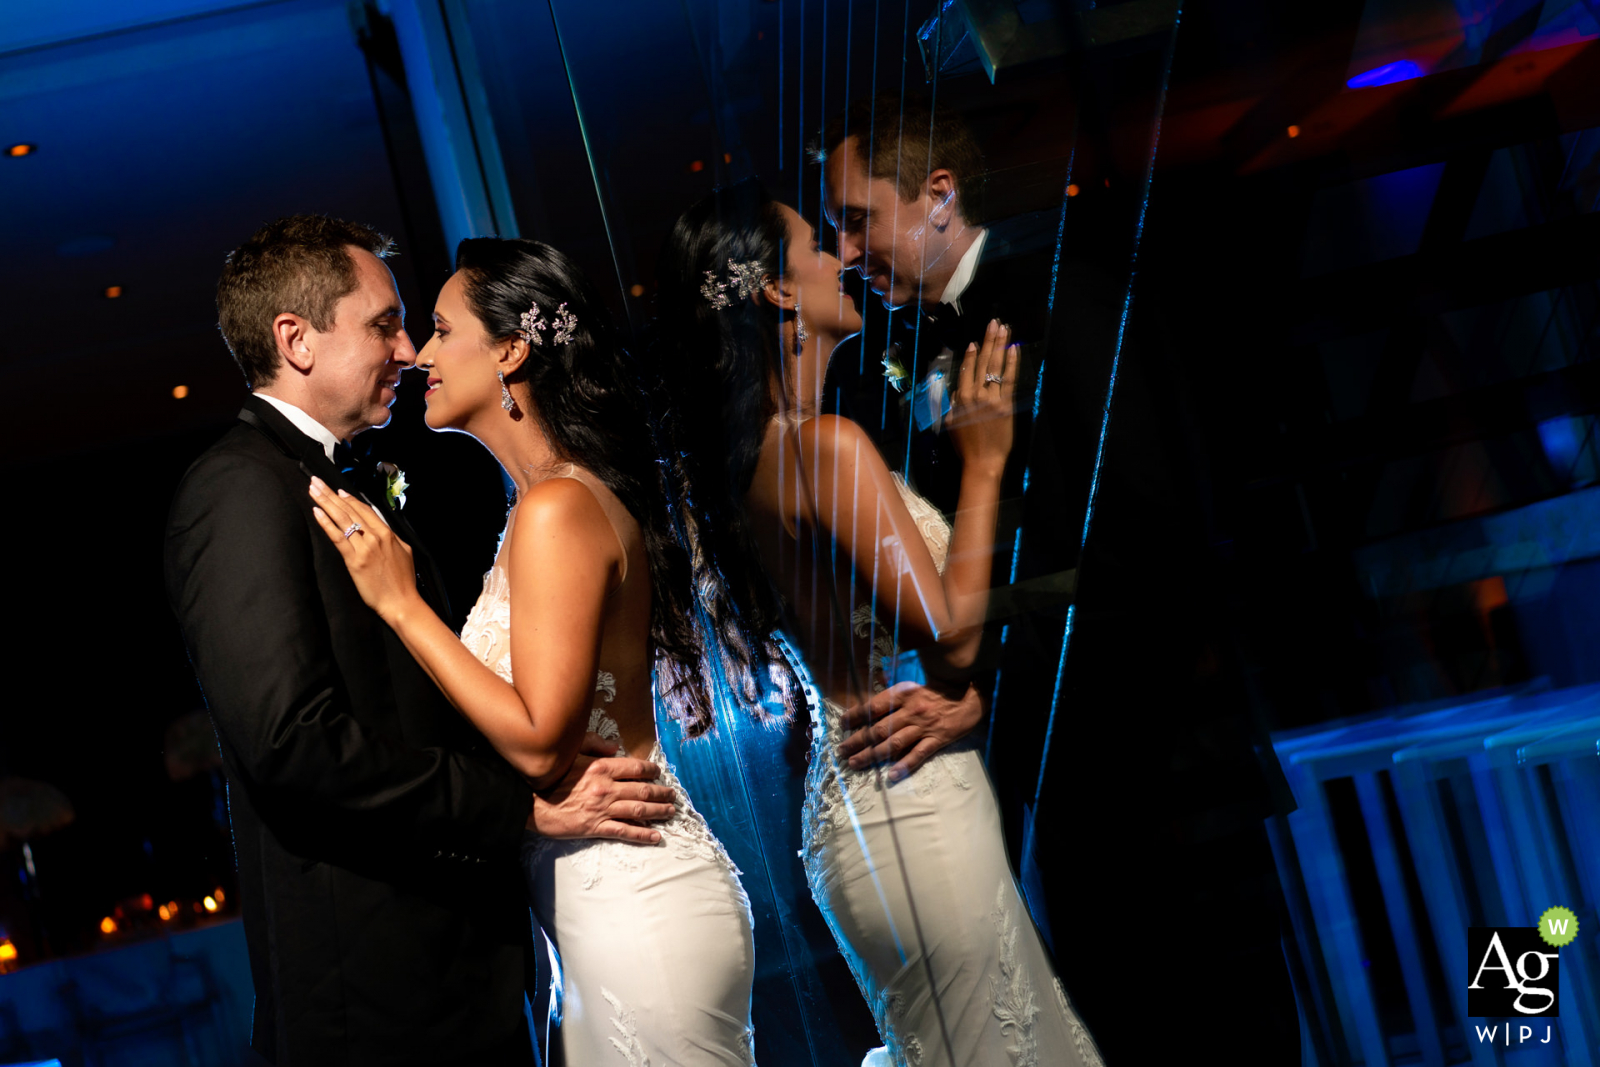 Reception - Condado Oceano Restaurant wedding venue photographer:  I used reflection, blue gel behind couple. 1 light over couple